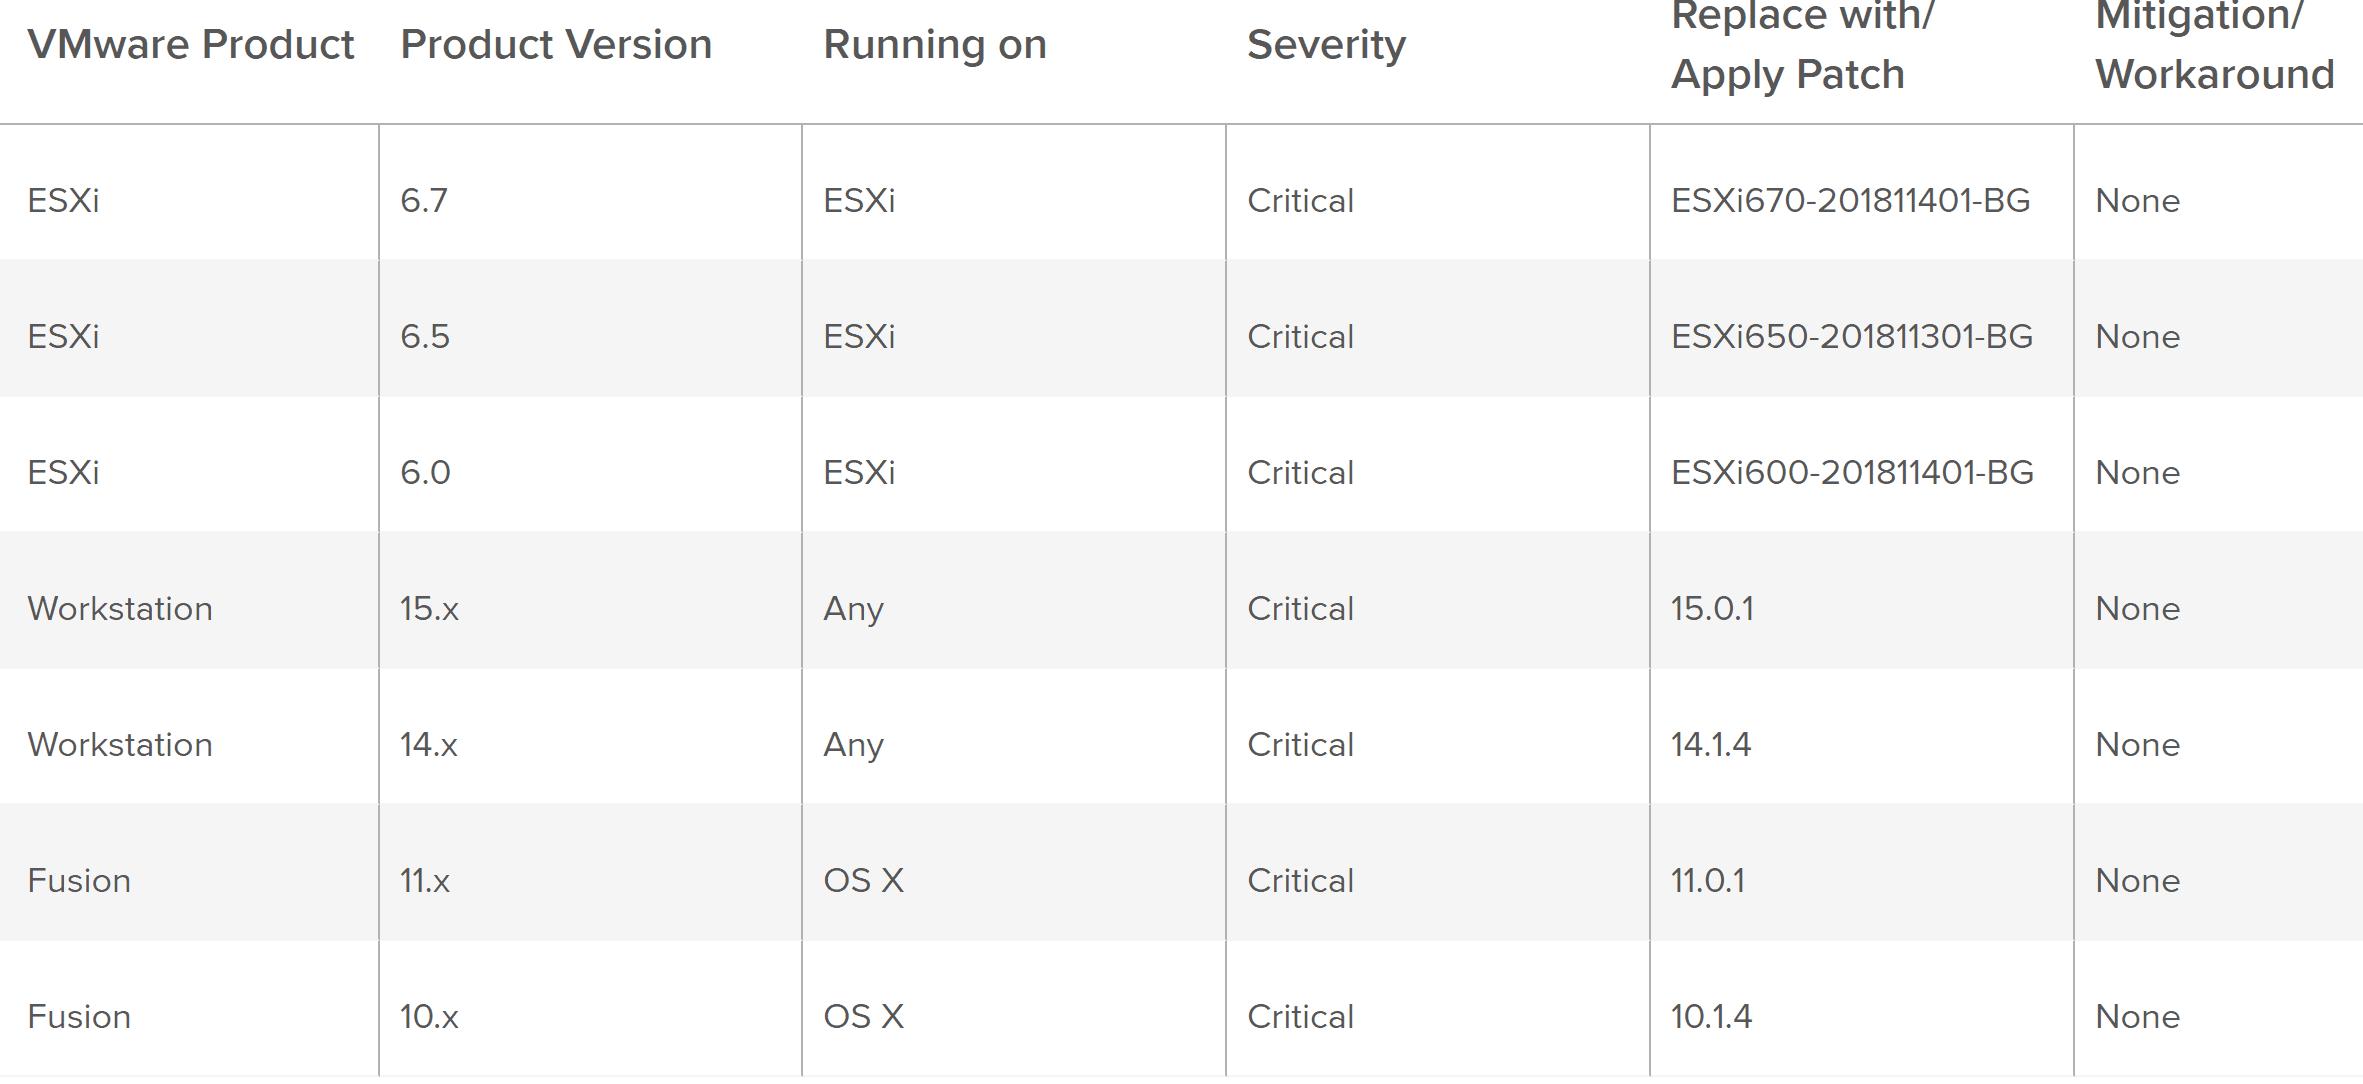 VMware-ESXi-Successful-VM-Escape-at-GeekPwn2018-Security-Patch VMware ESXi Successful VM Escape at GeekPwn2018 Security Patch